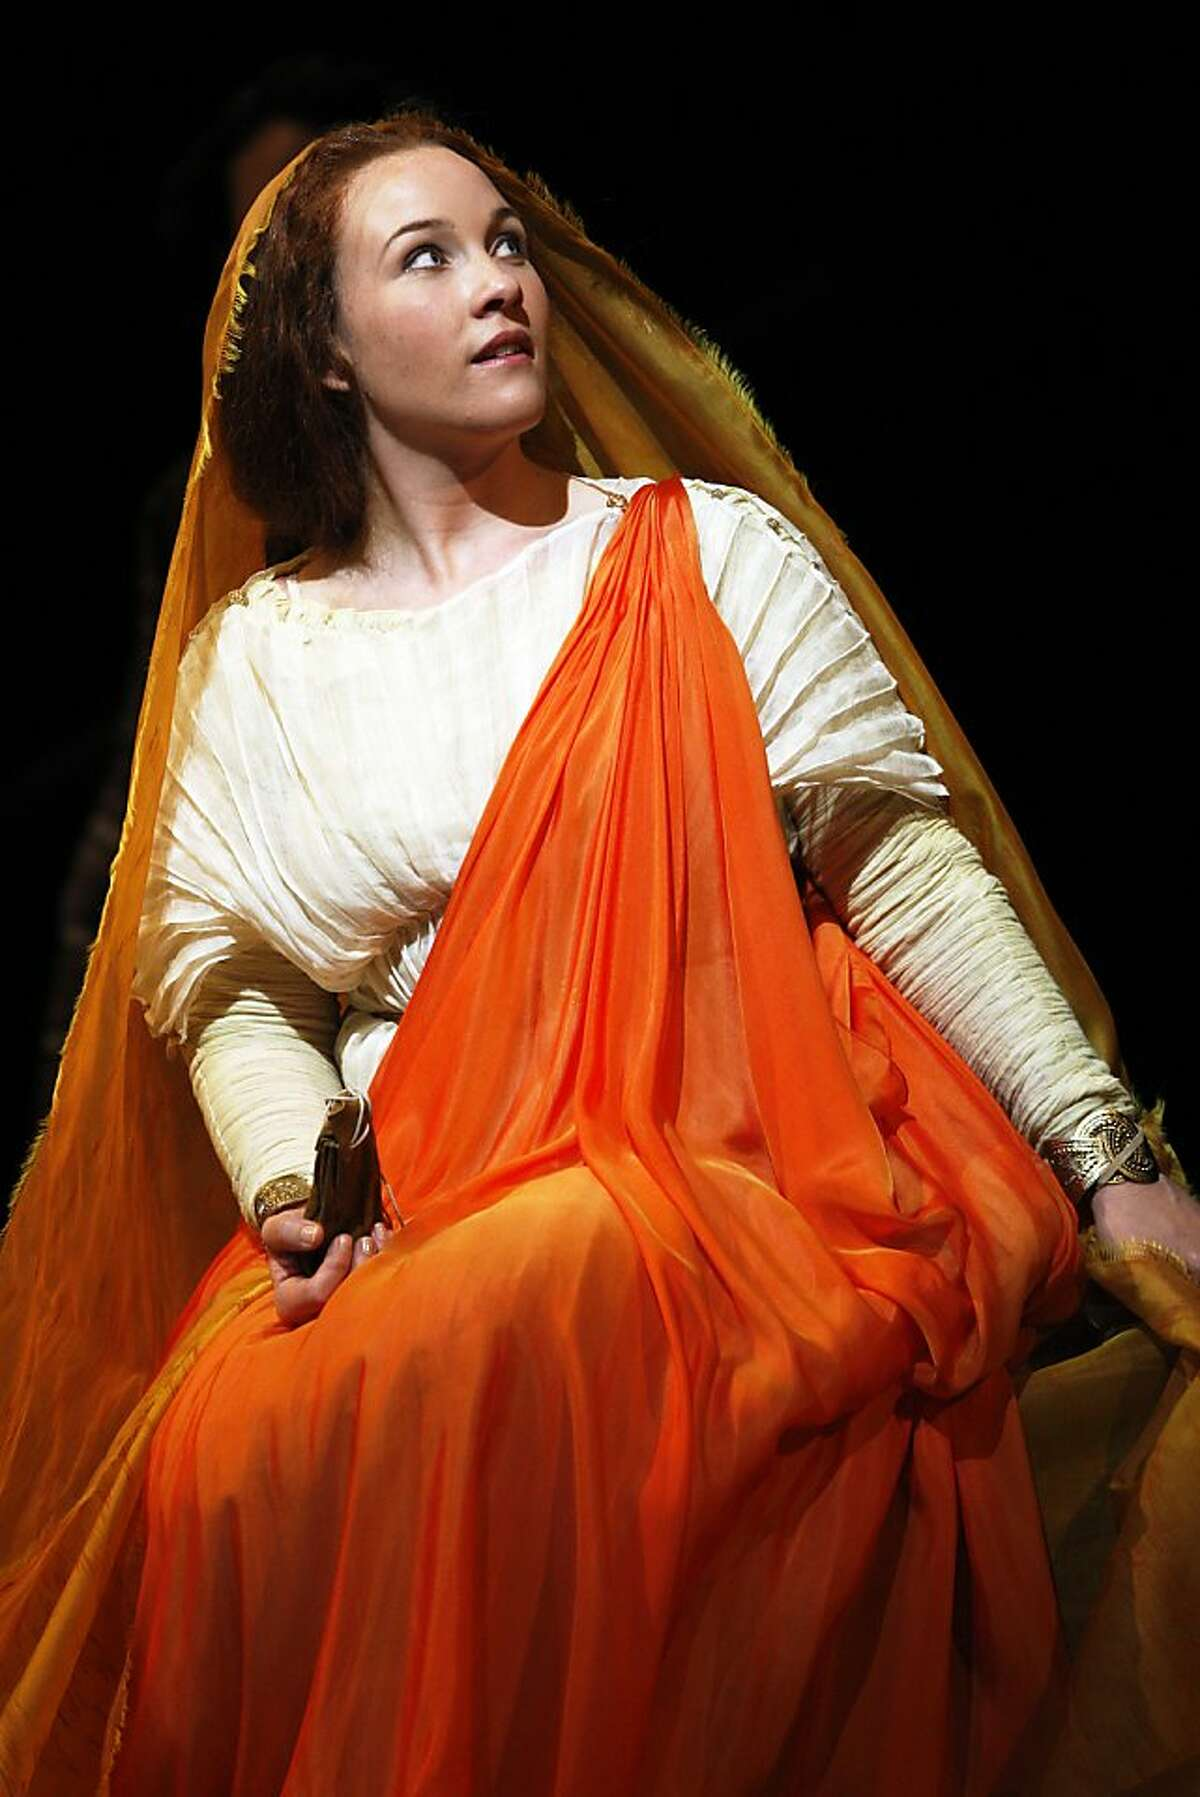 Sasha Cooke as Mary Magdalene in the world premiere of Mark Adamo's The Gospel of Mary Magdalene on Sunday, June 16, 2013 in San Francisco, Calif.